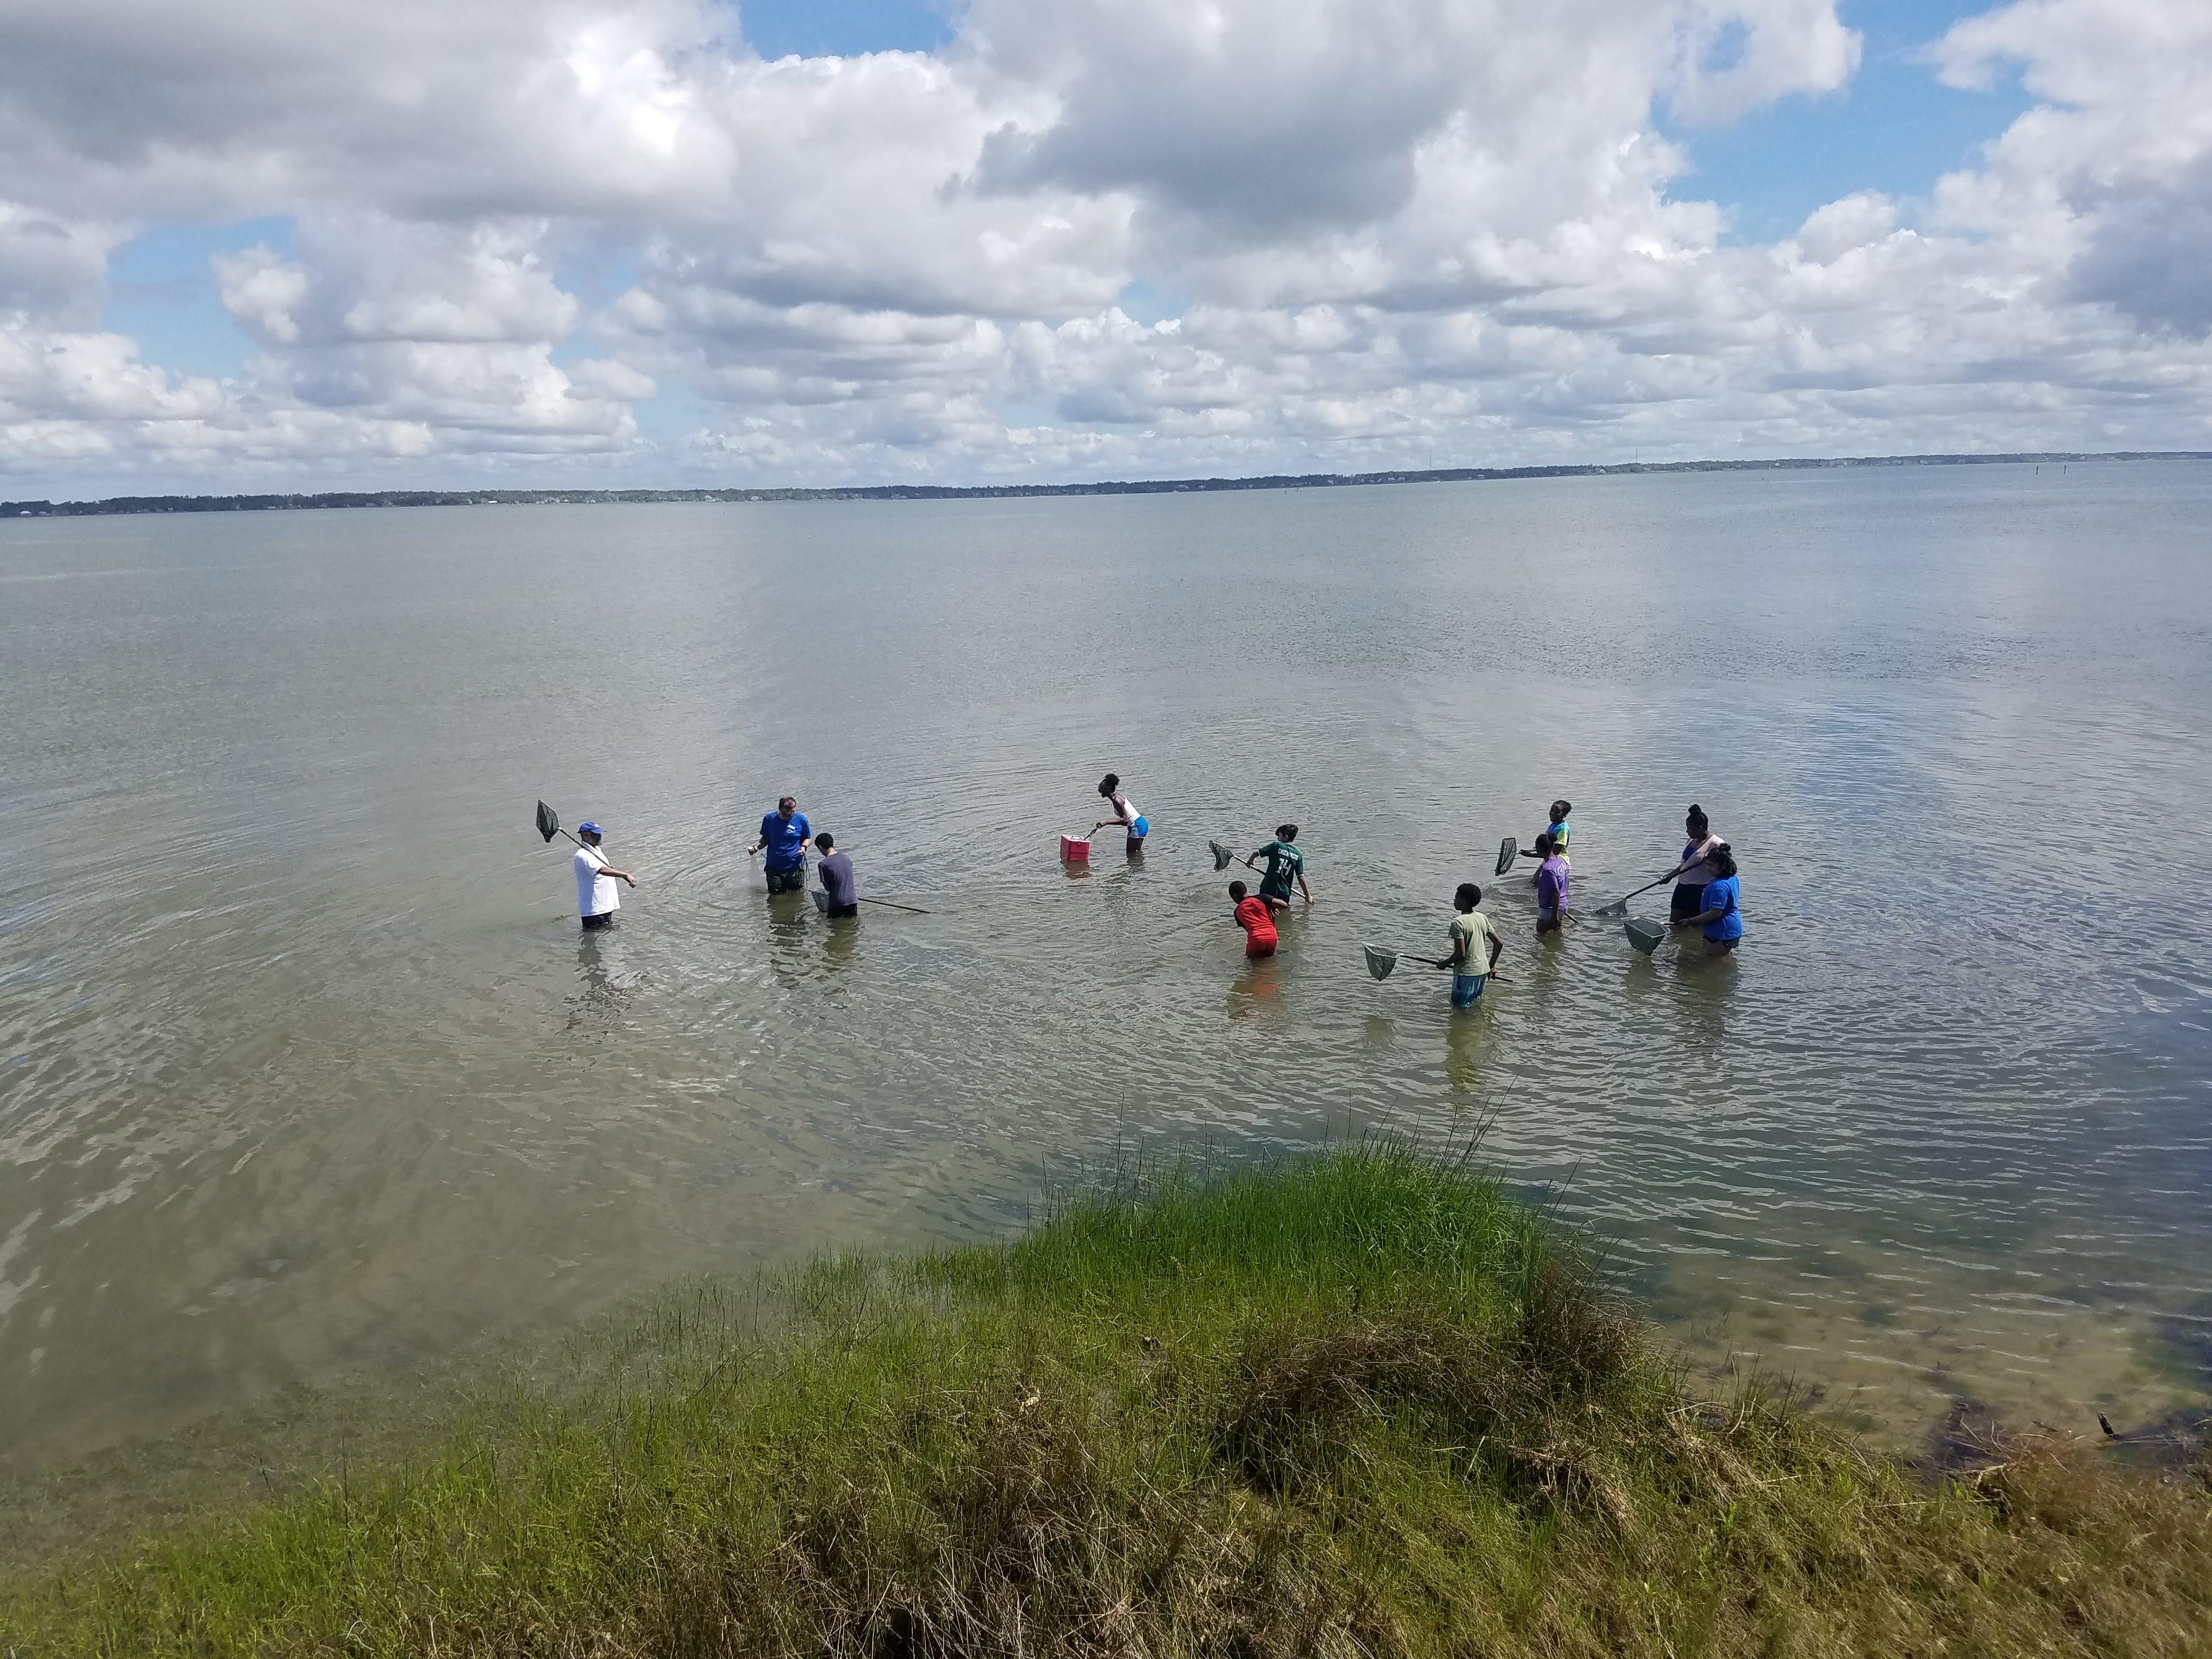 BOOST 6th grade scholars explore Bogue Sound in Pine Knoll Shores